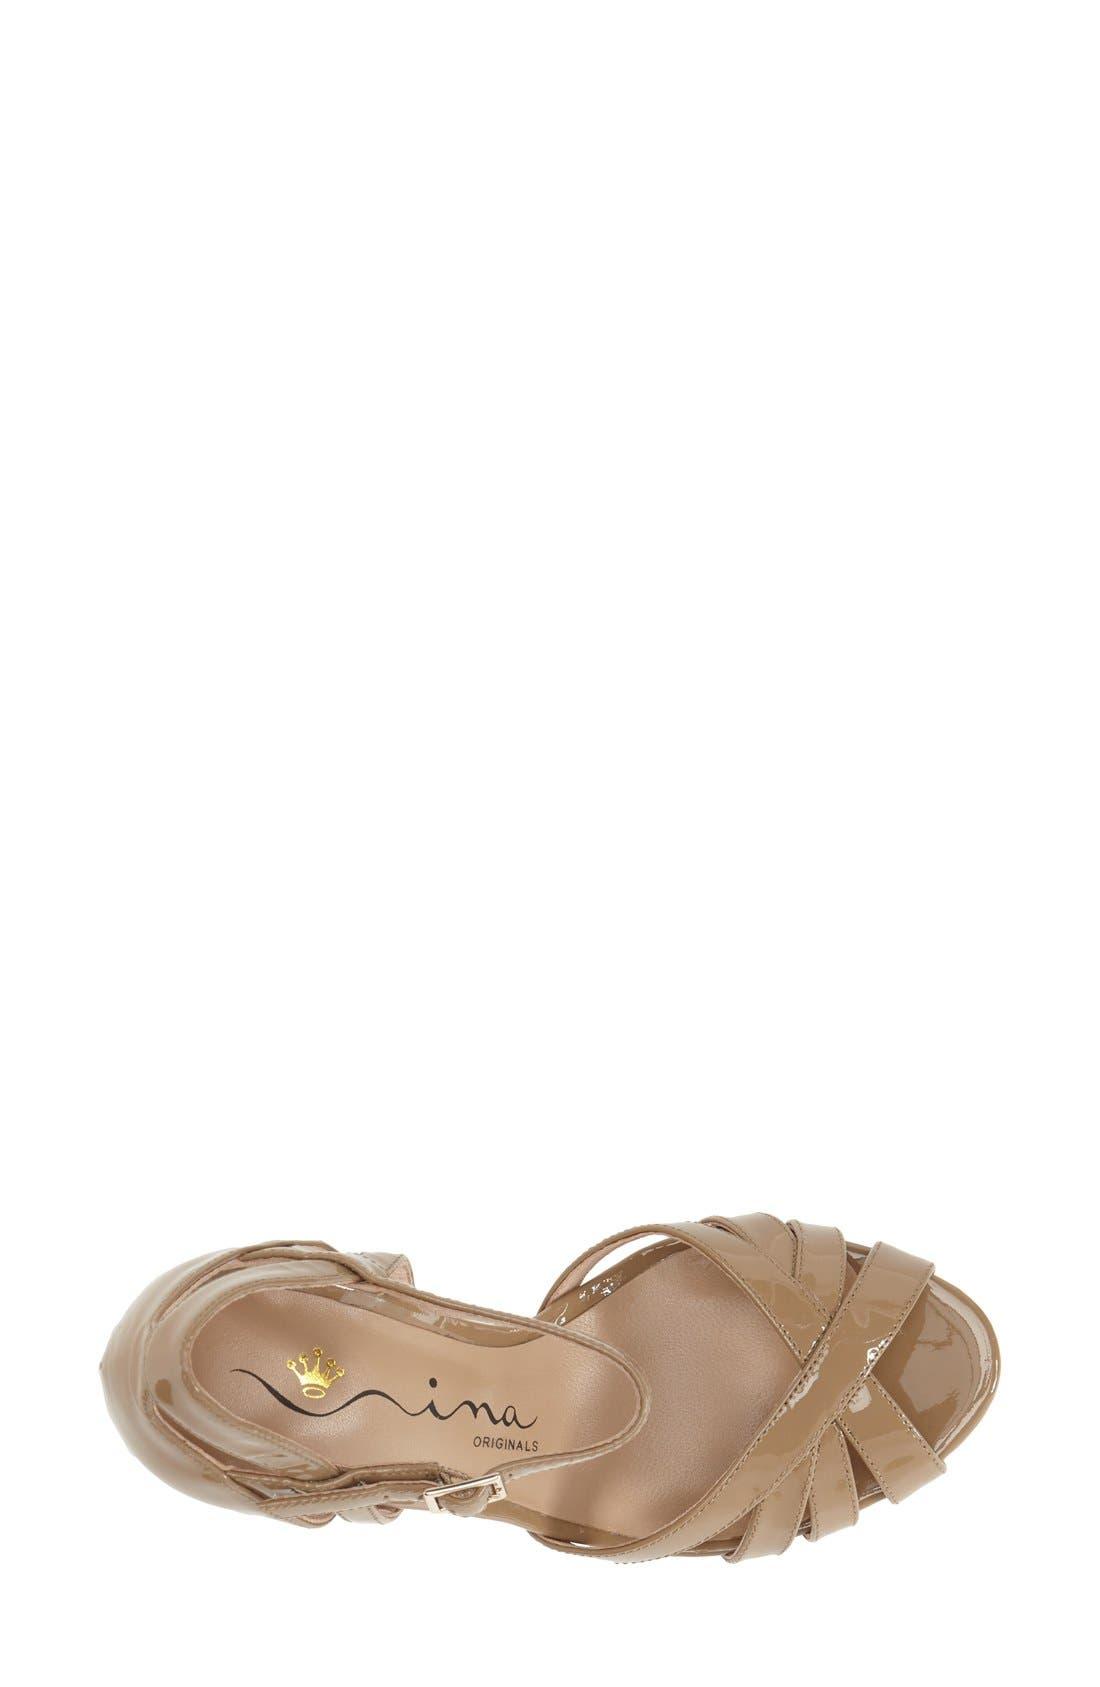 Alternate Image 3  - Nina Originals 'Senora' Ankle Strap Sandal (Women)